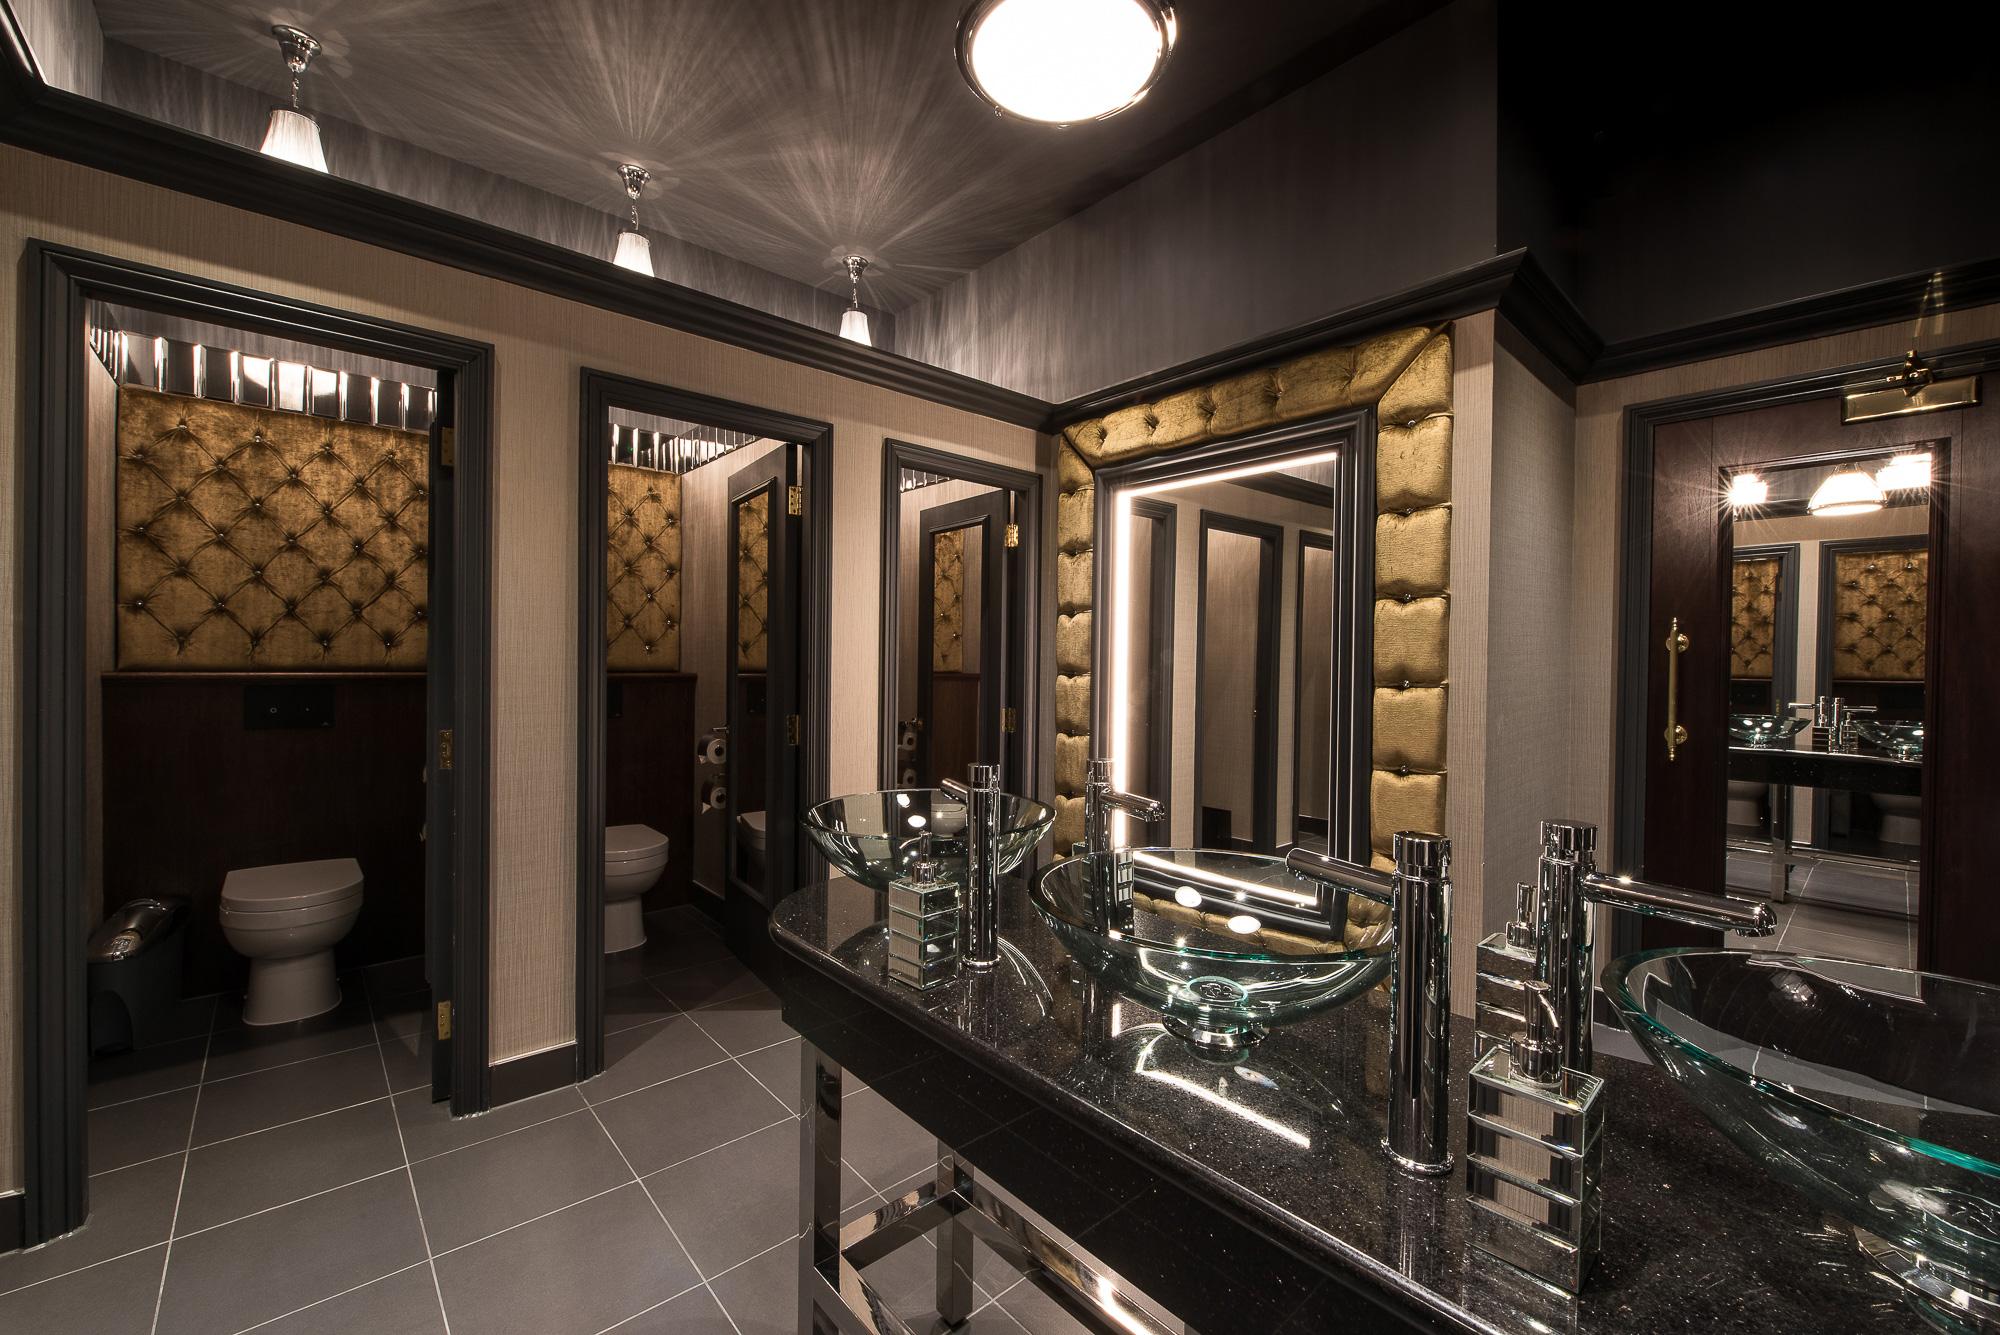 hotel-restrooms-interior-photography-detail.jpg